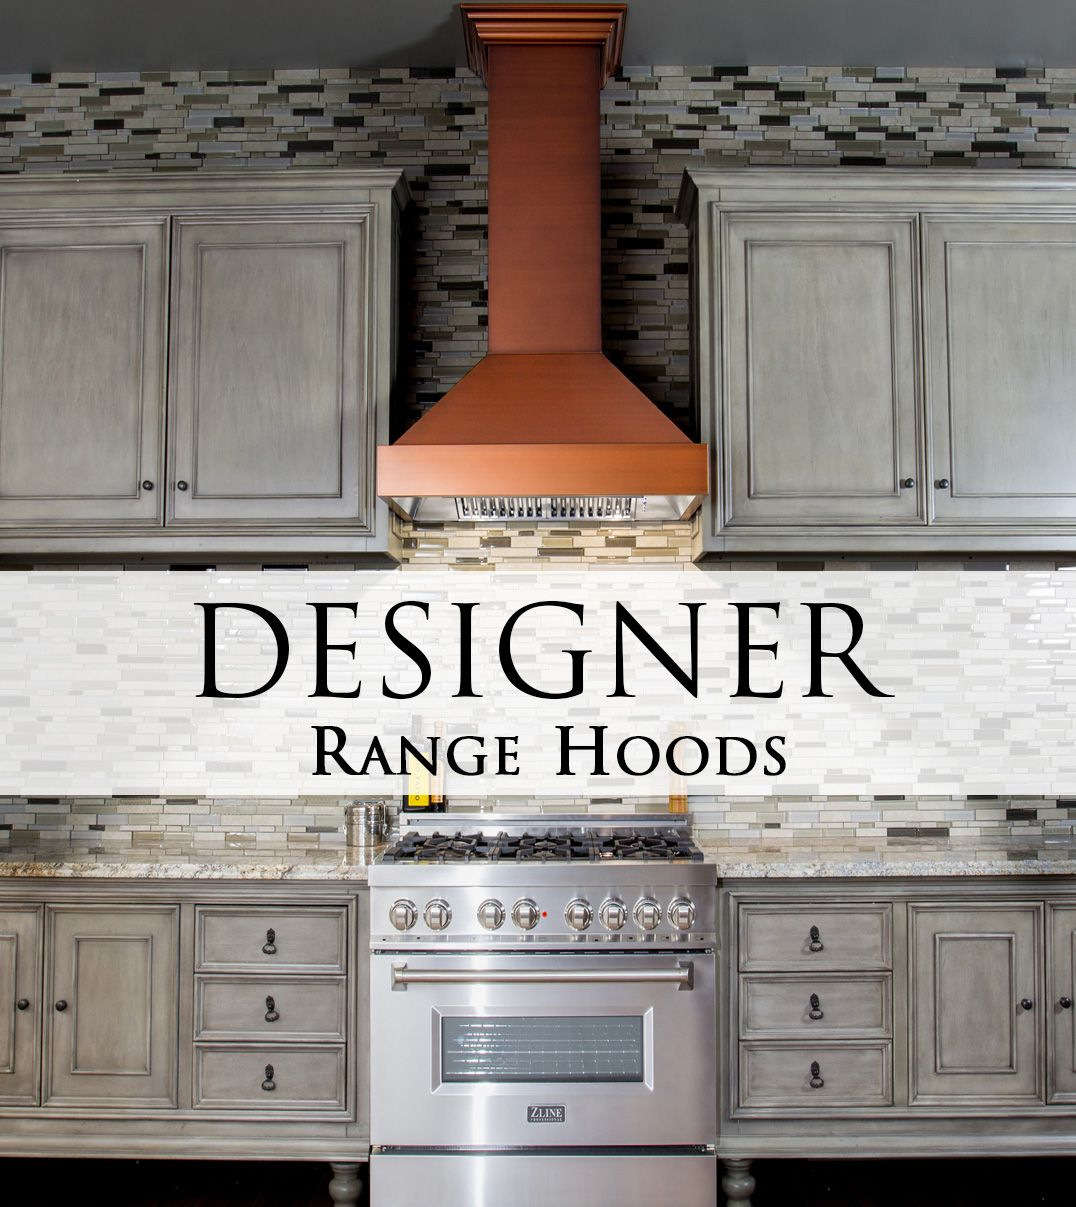 Zline Is The Industry Leader In Designer Range Hoods Stainless Steel Handcrafted Wood And 7 Layer Coppe Kitchen Range Hood Stainless Range Hood Range Hoods